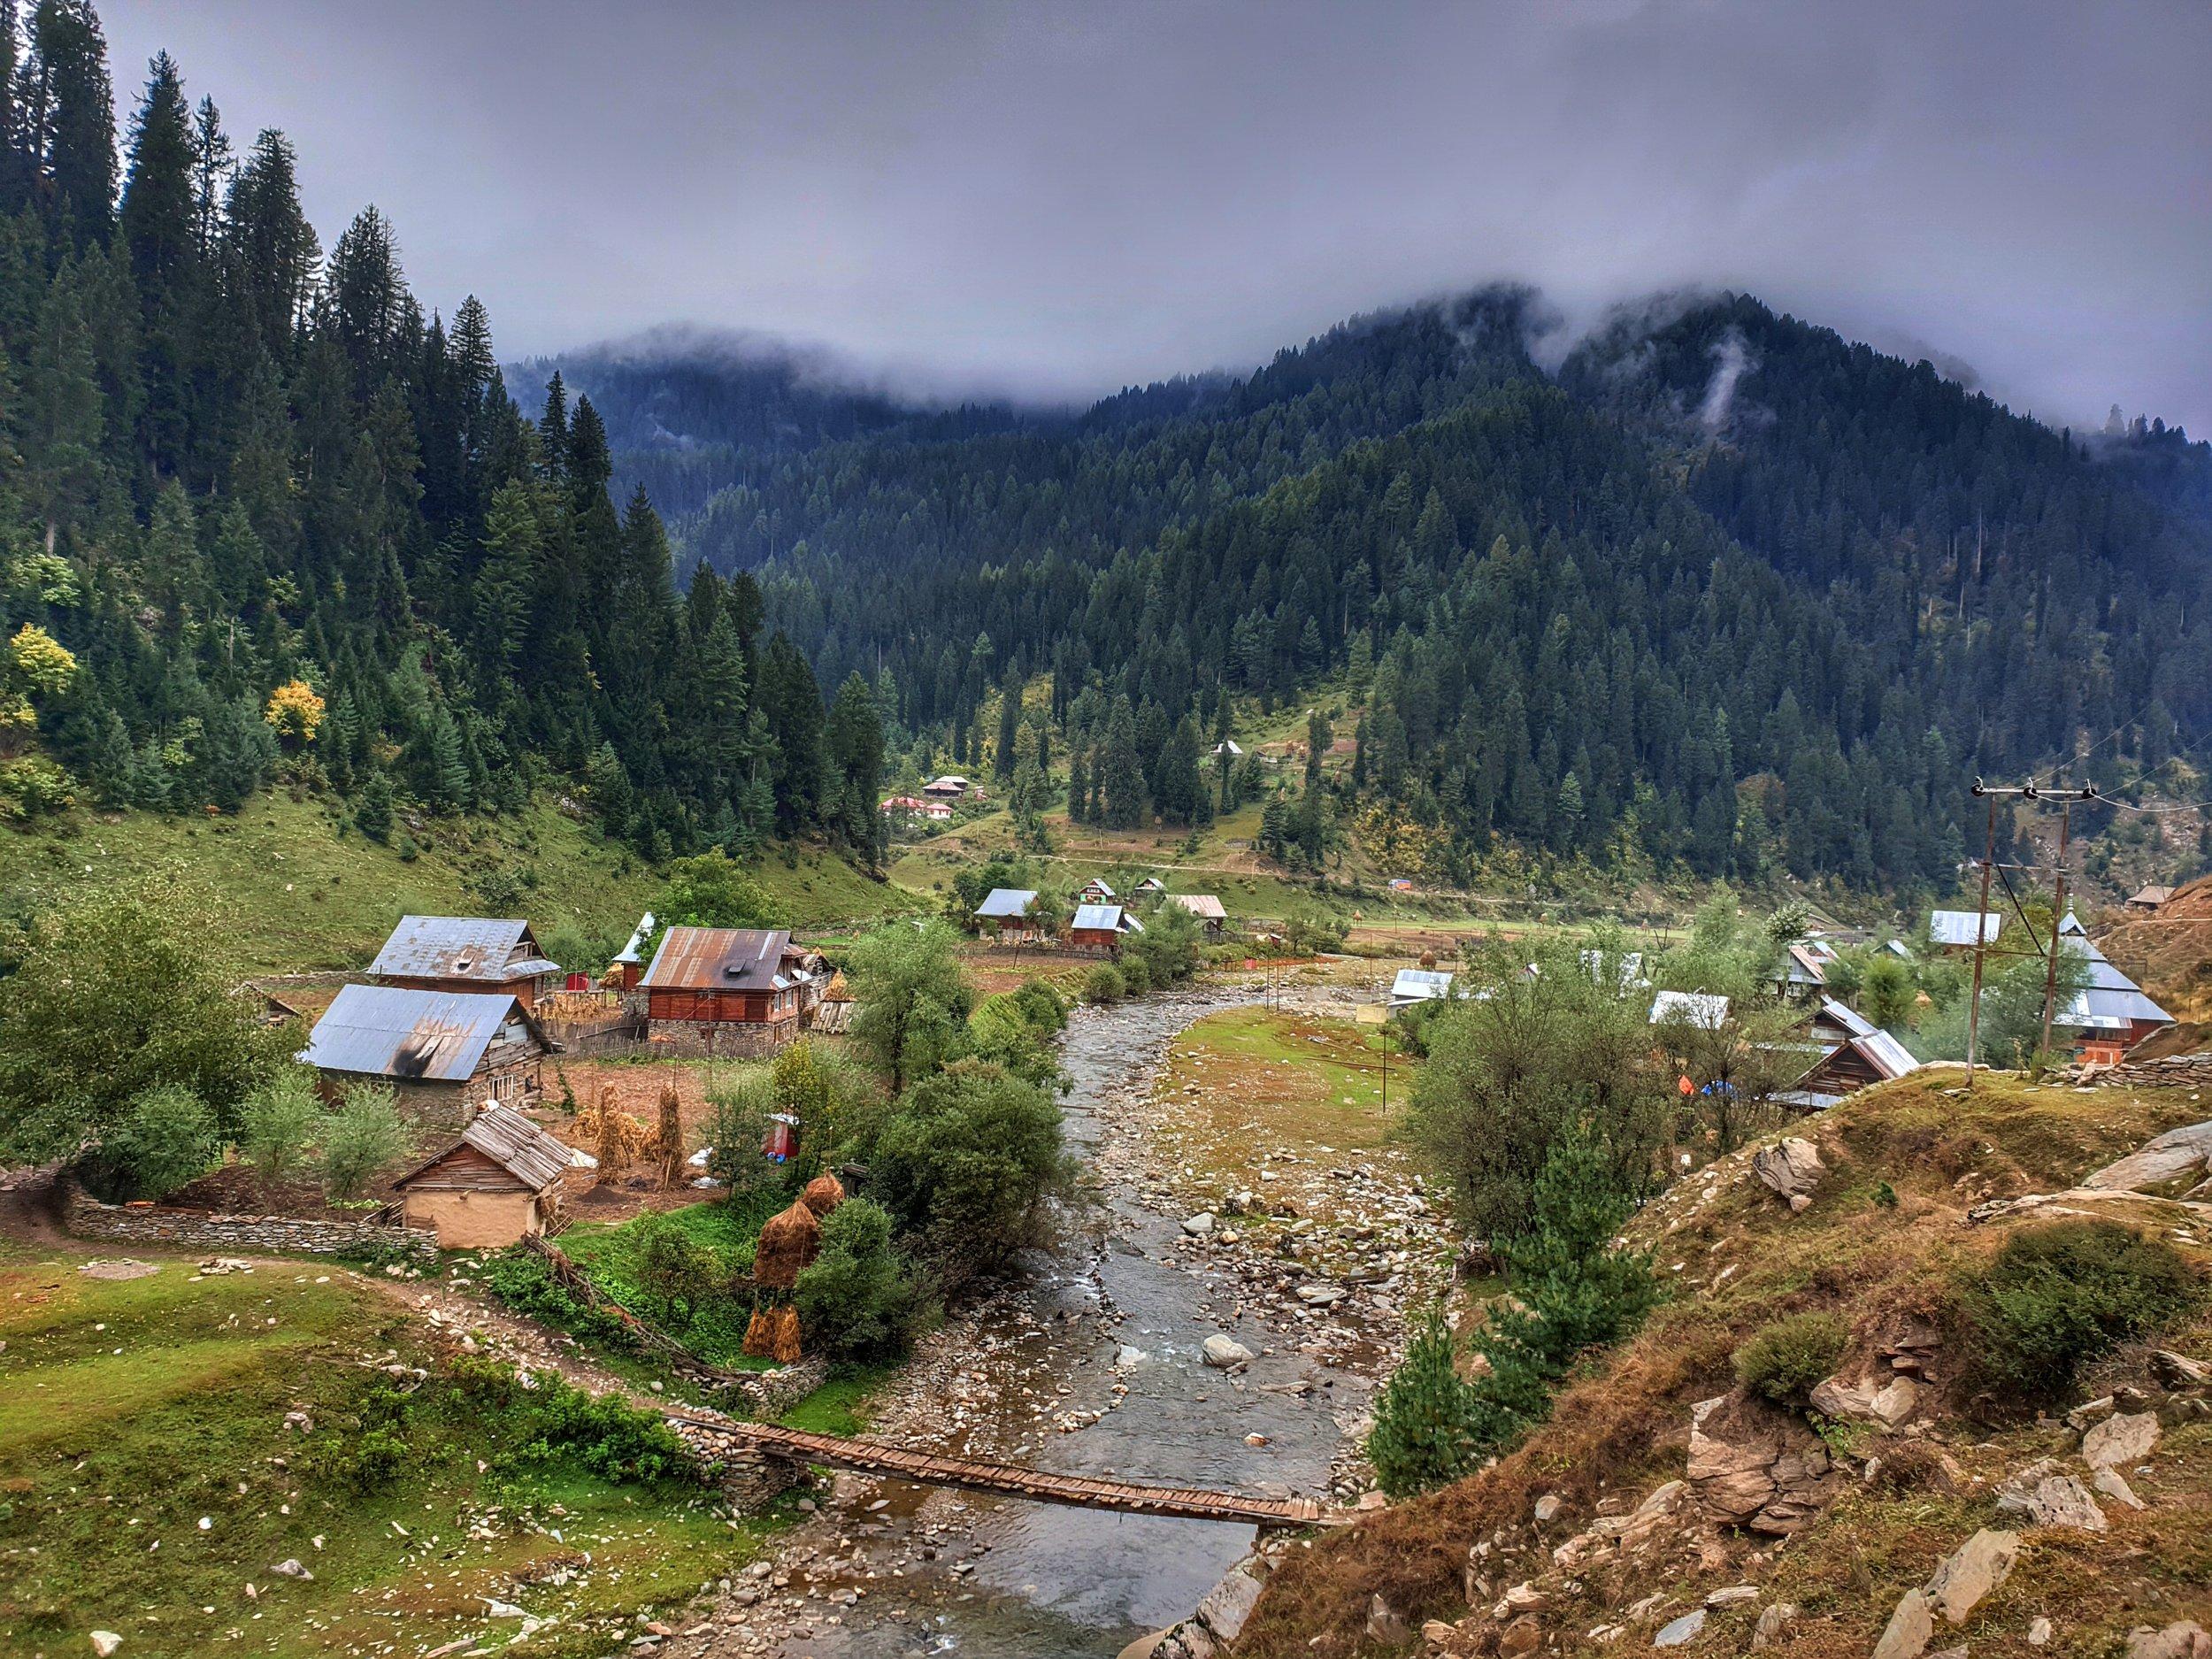 kashmir-kupwara-border-loc-pakistan